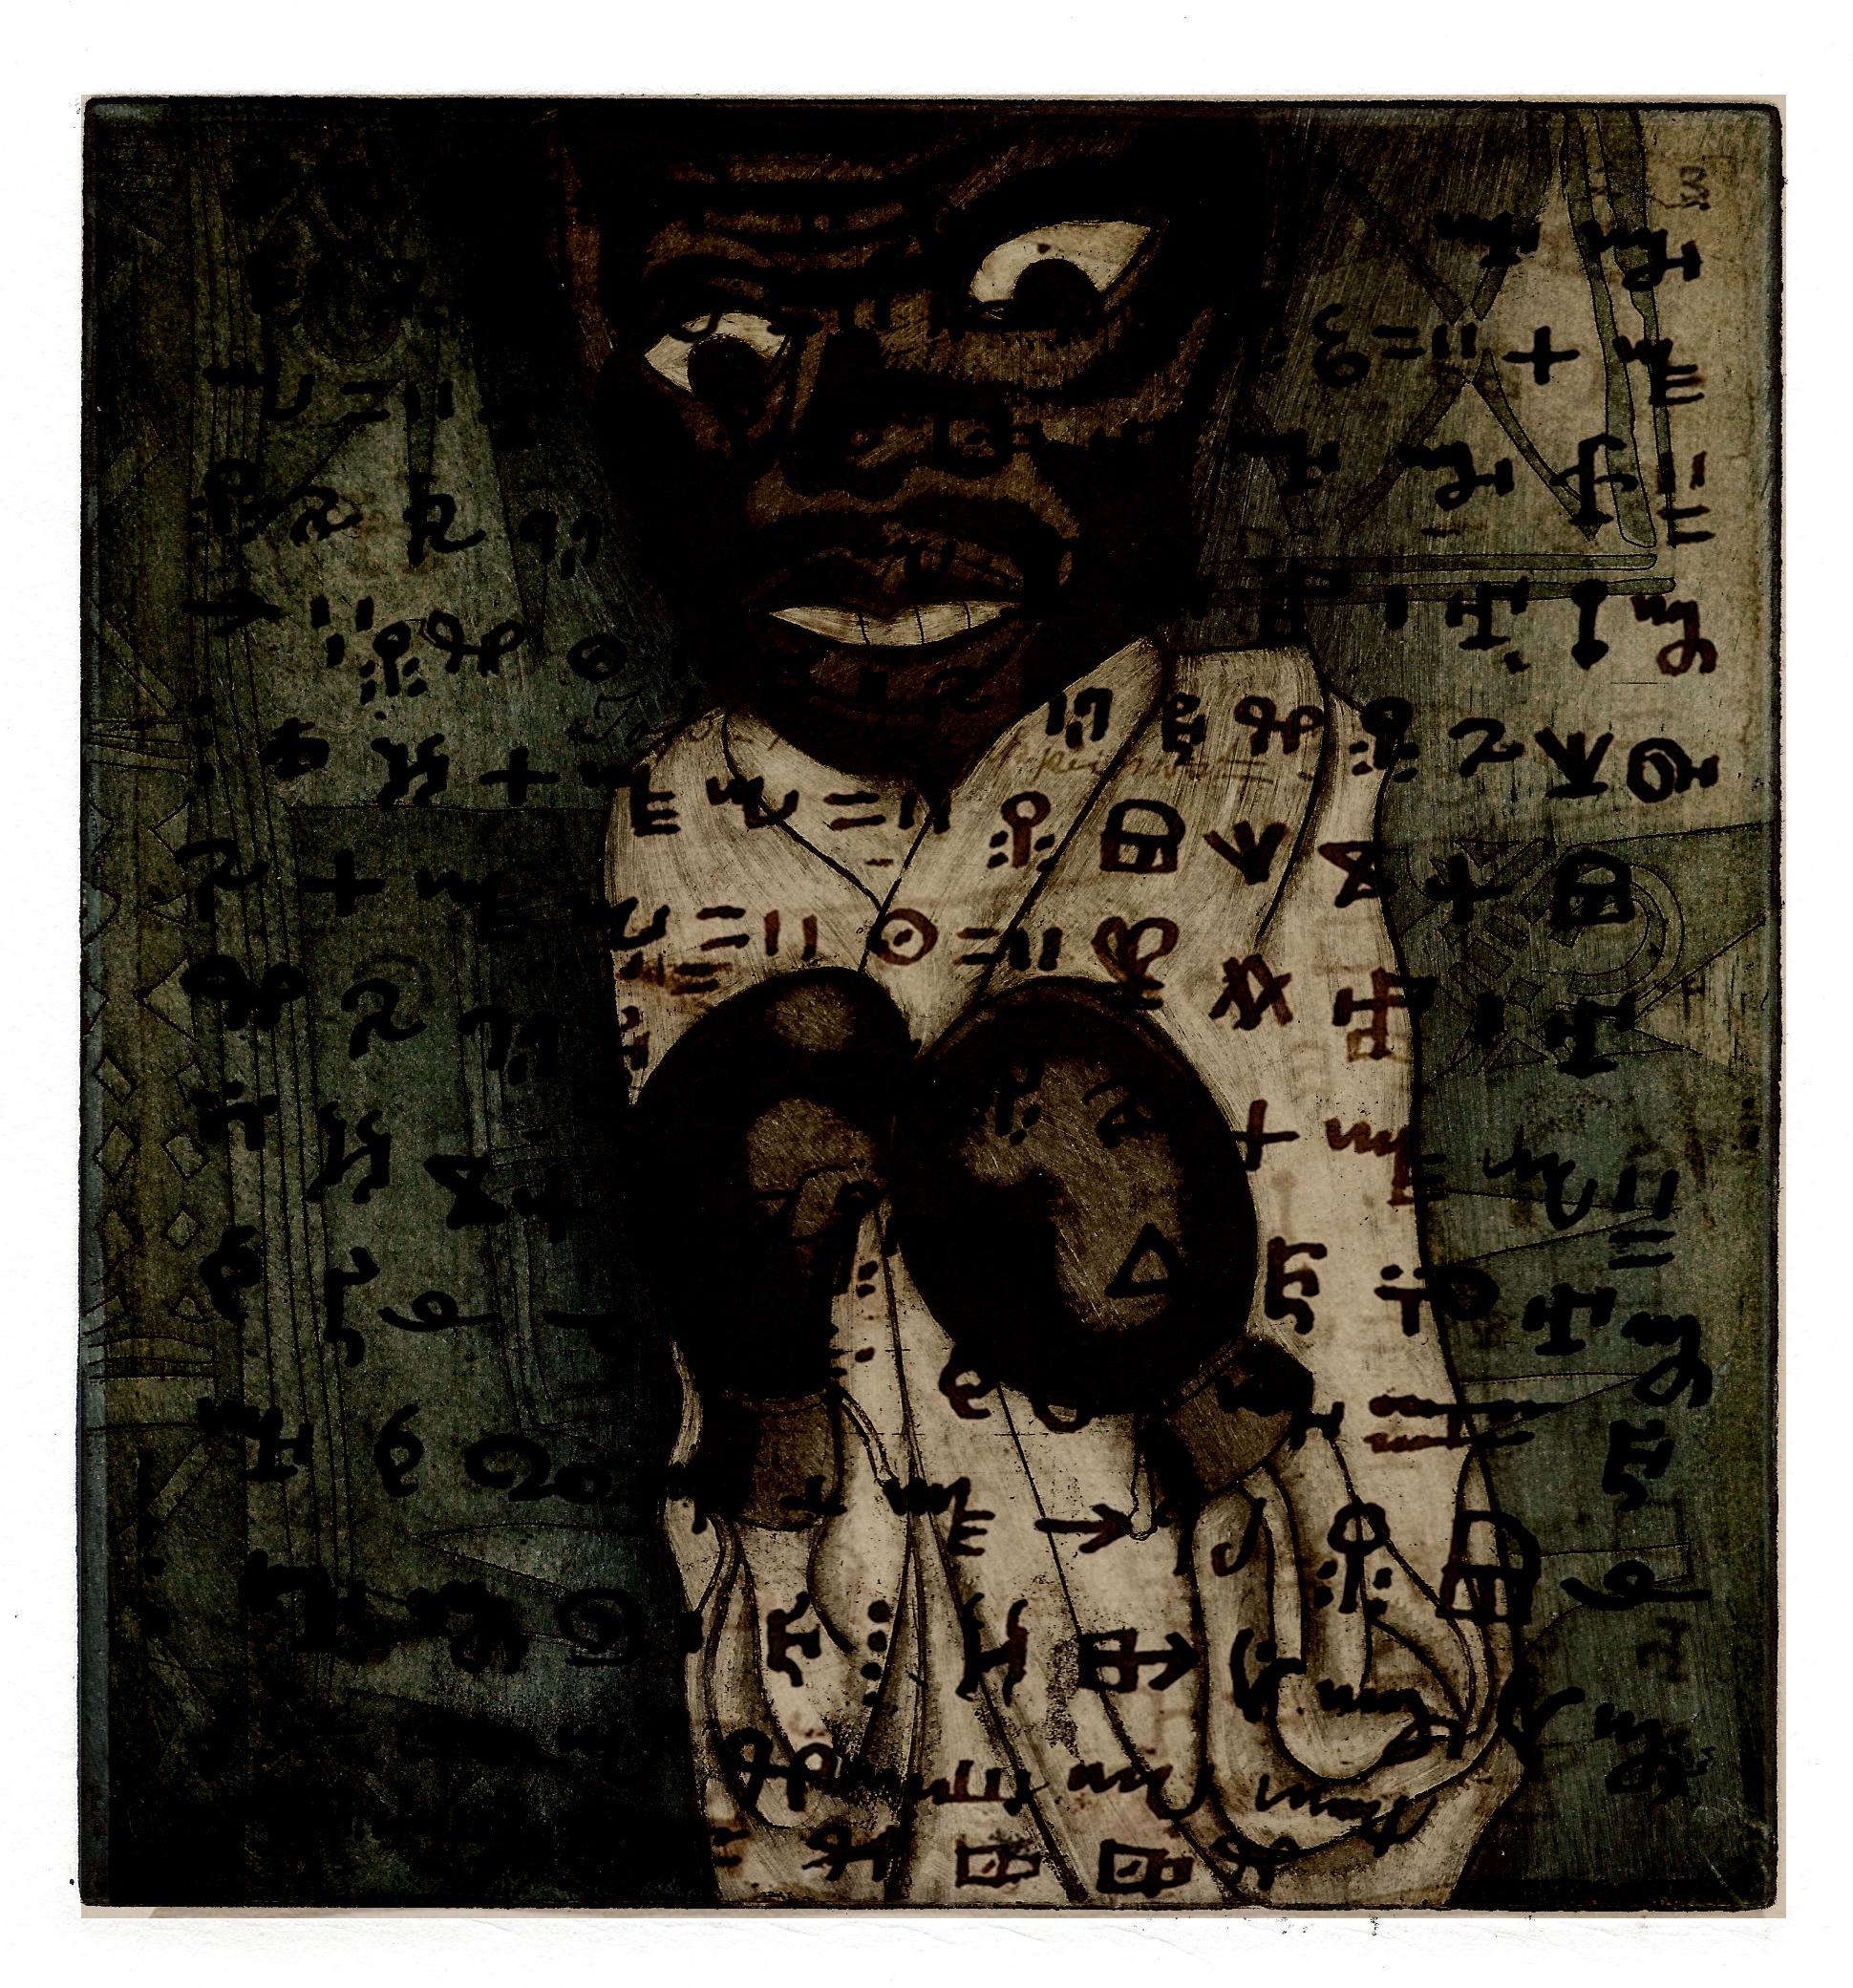 Black Lives and Vai script